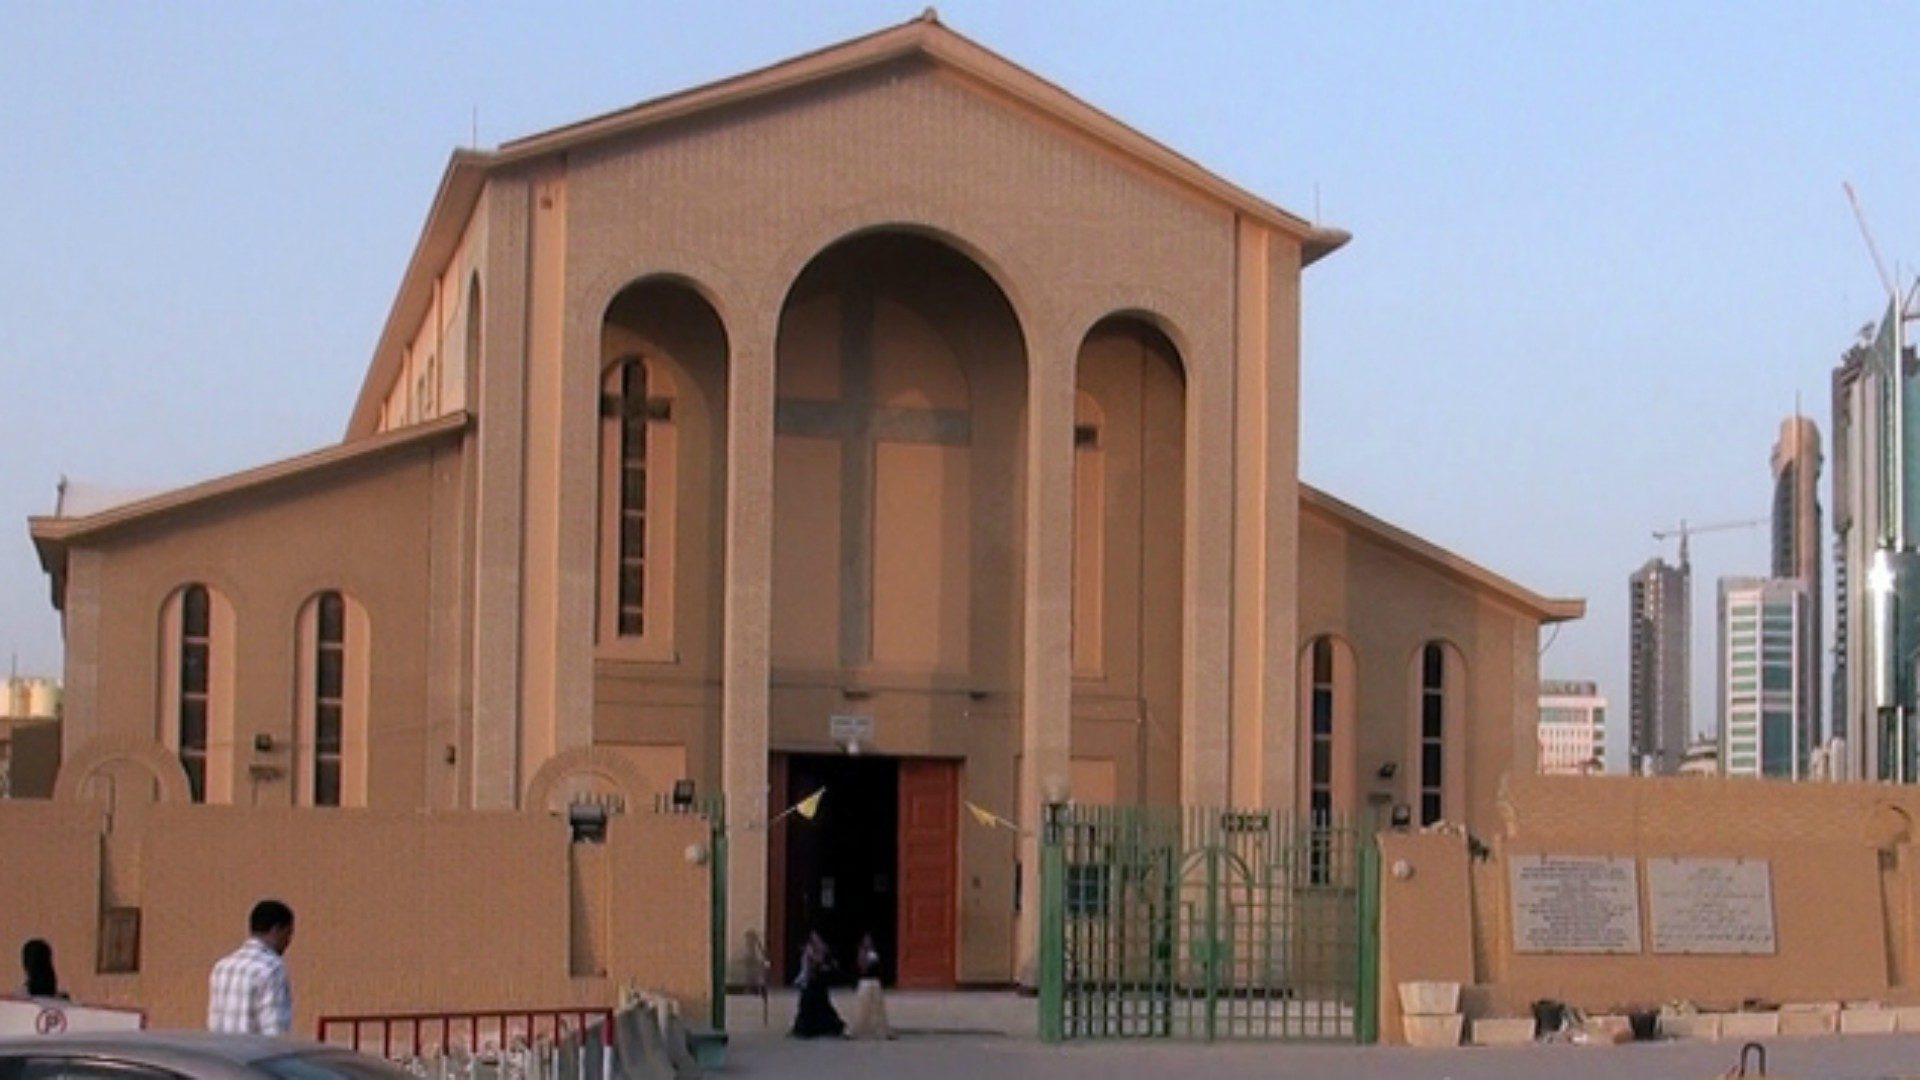 ch Cath Koweït Koweït Archives Archives Cath HYW2ID9E